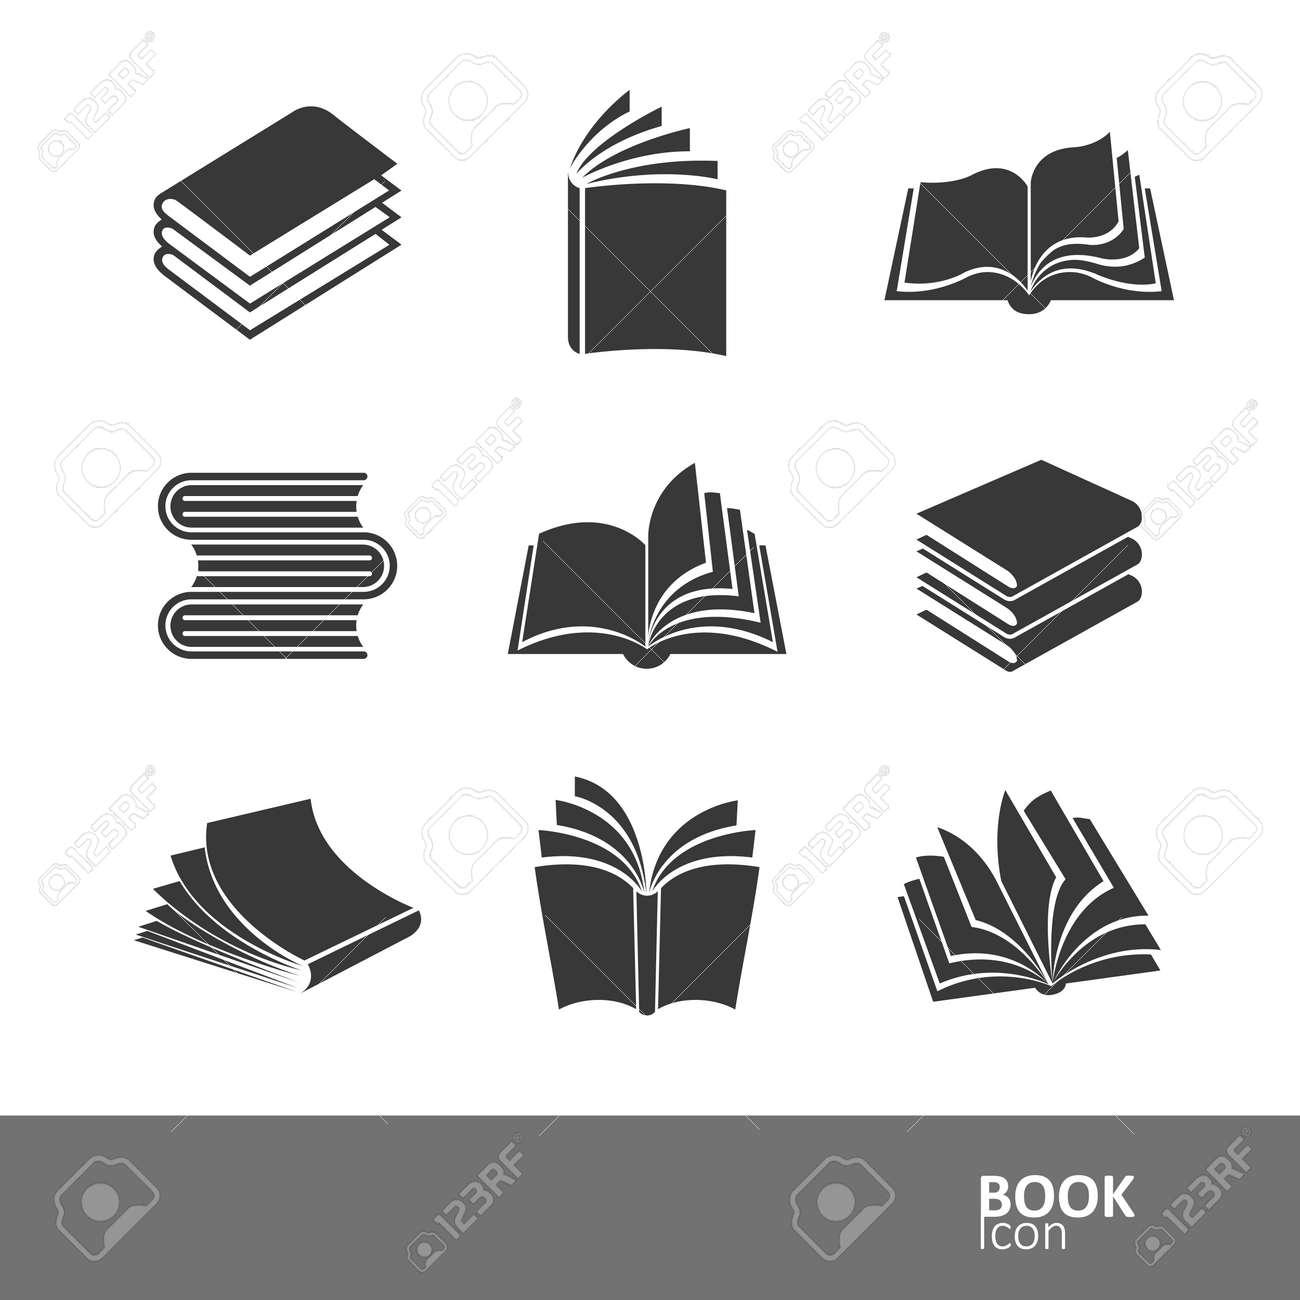 book silhouette icon set,vector illustration Stock Vector - 39556859